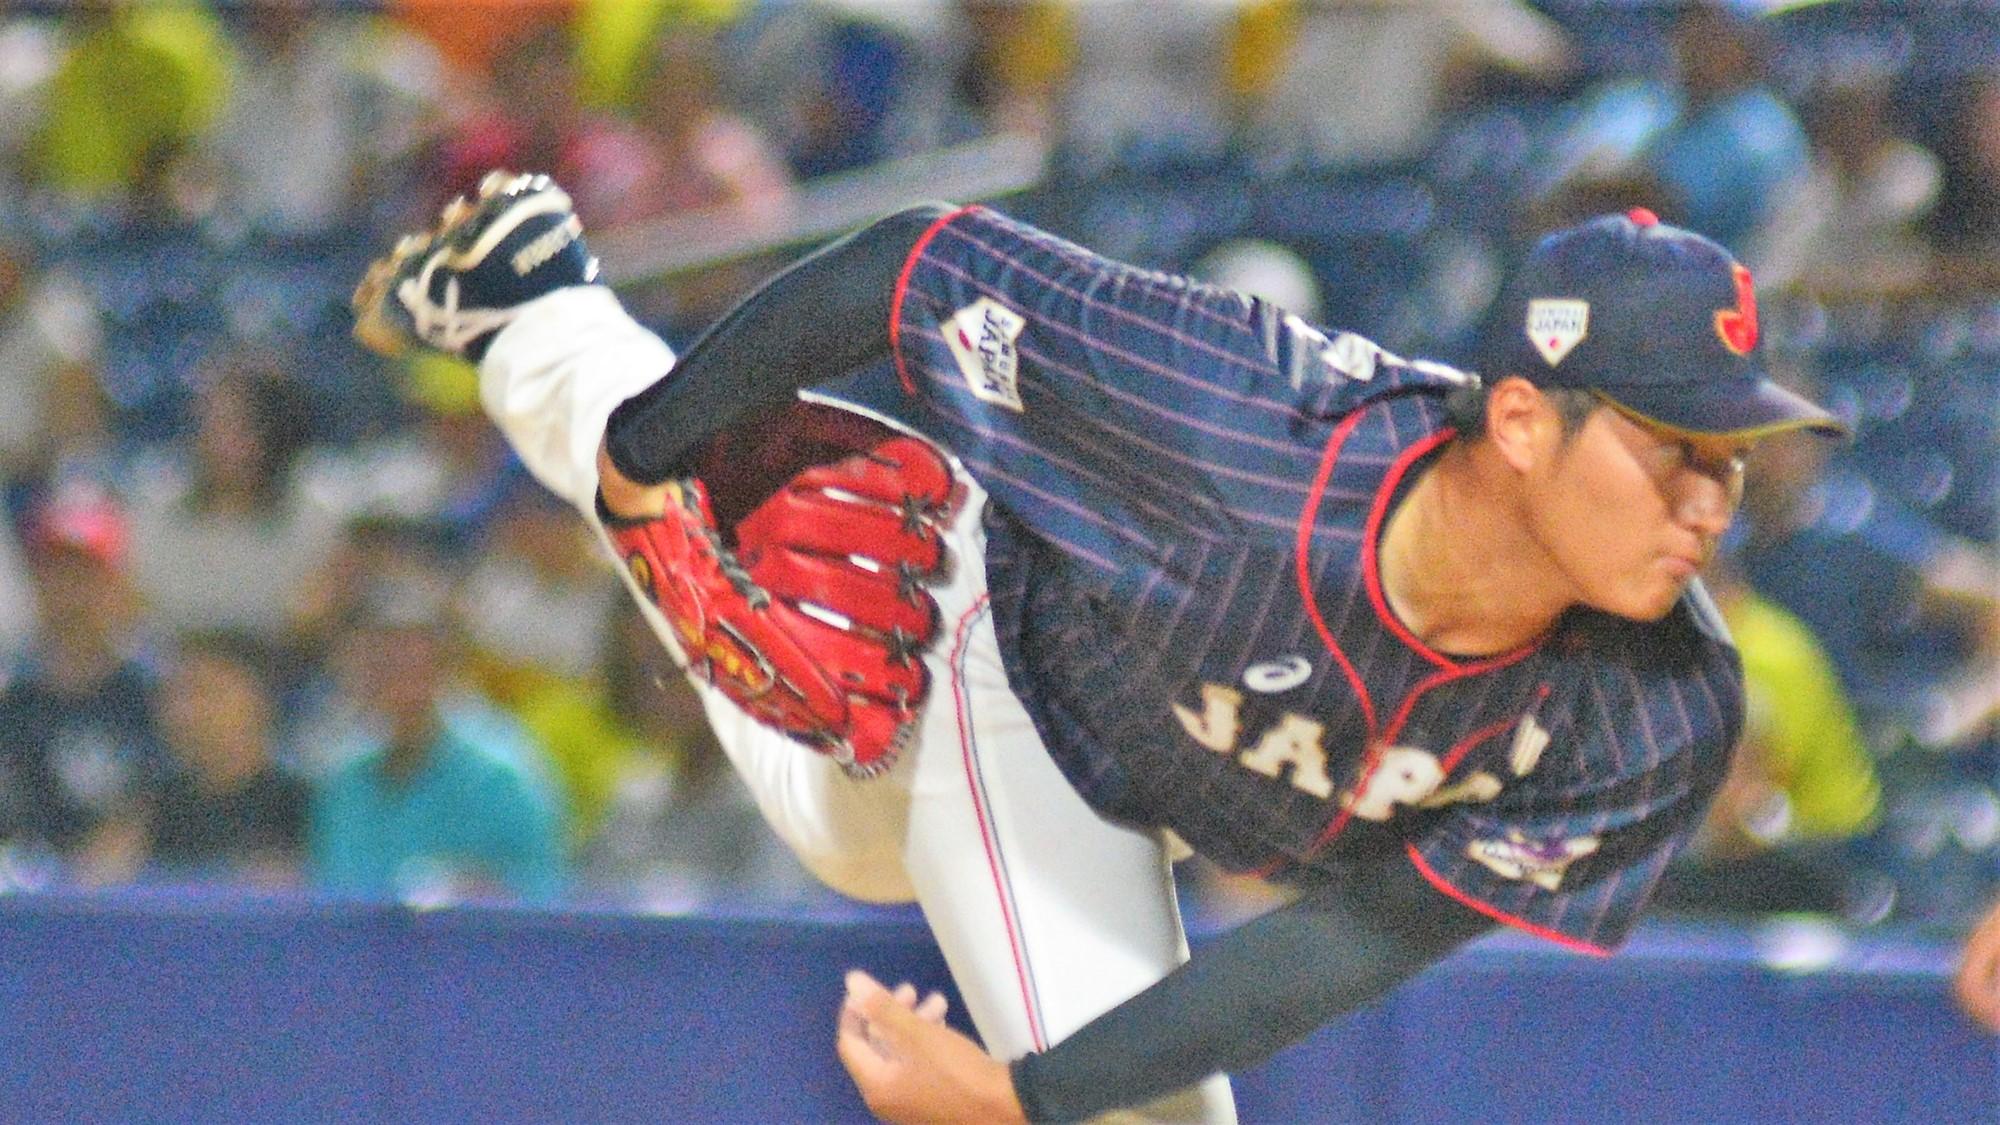 Naruki Terashima picked the win for Japan